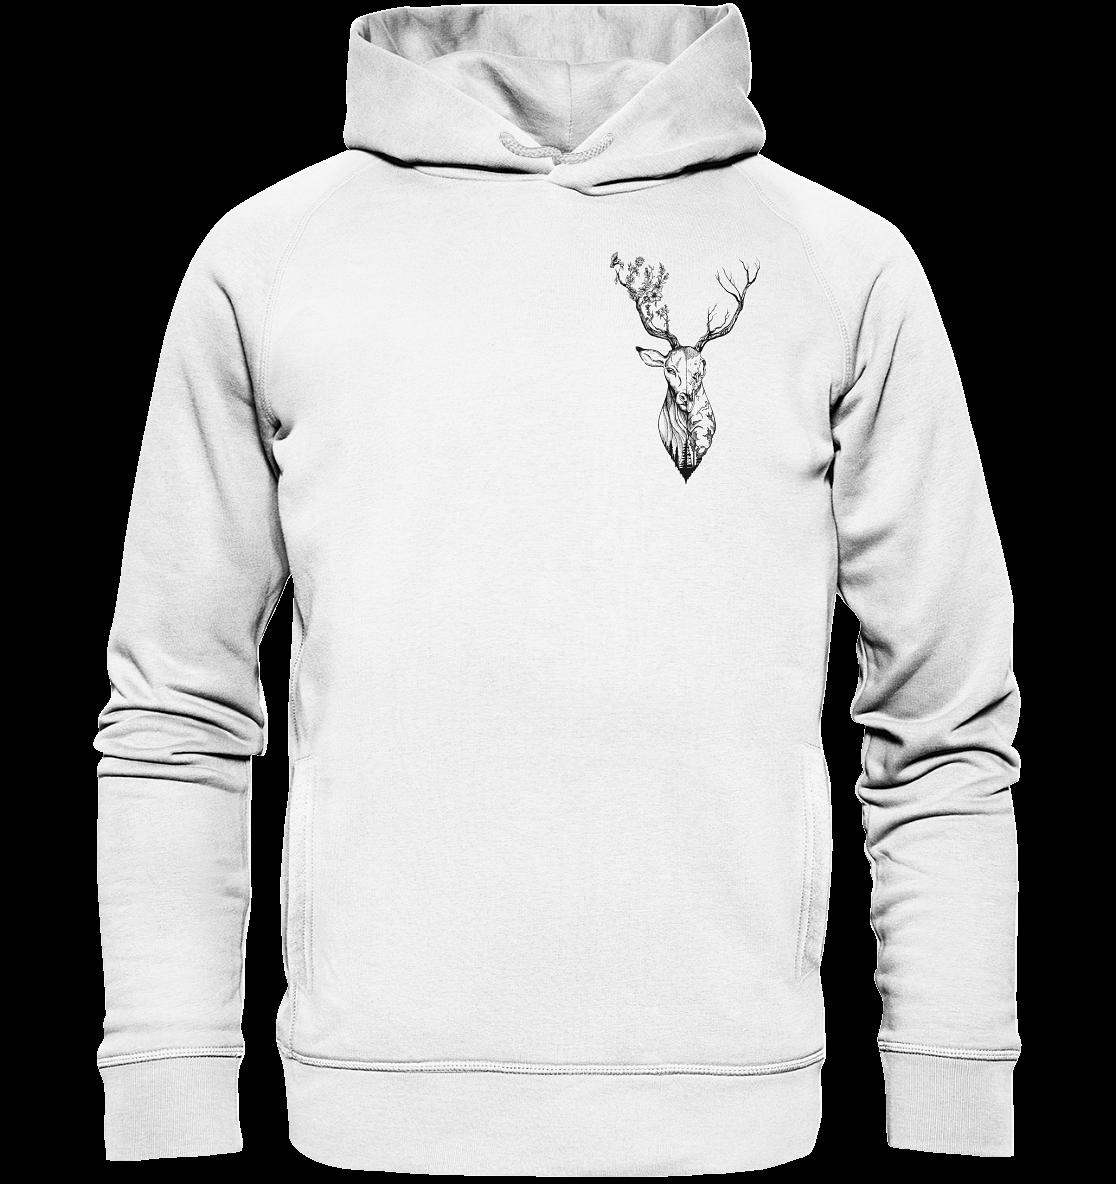 front-organic-fashion-hoodie-f8f8f8-1116x-7.png